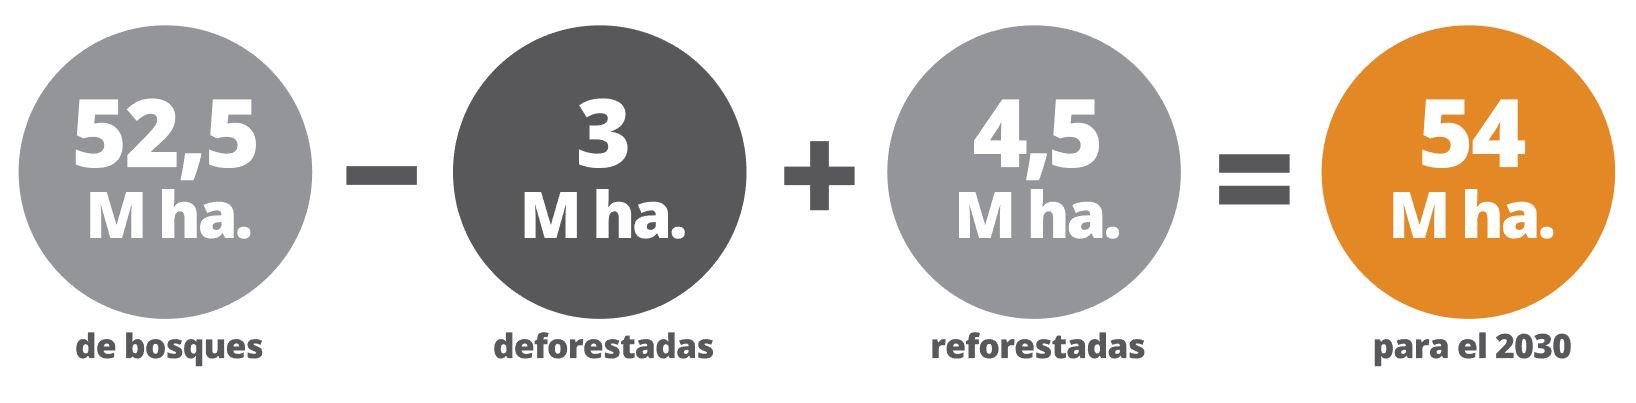 resaltado1